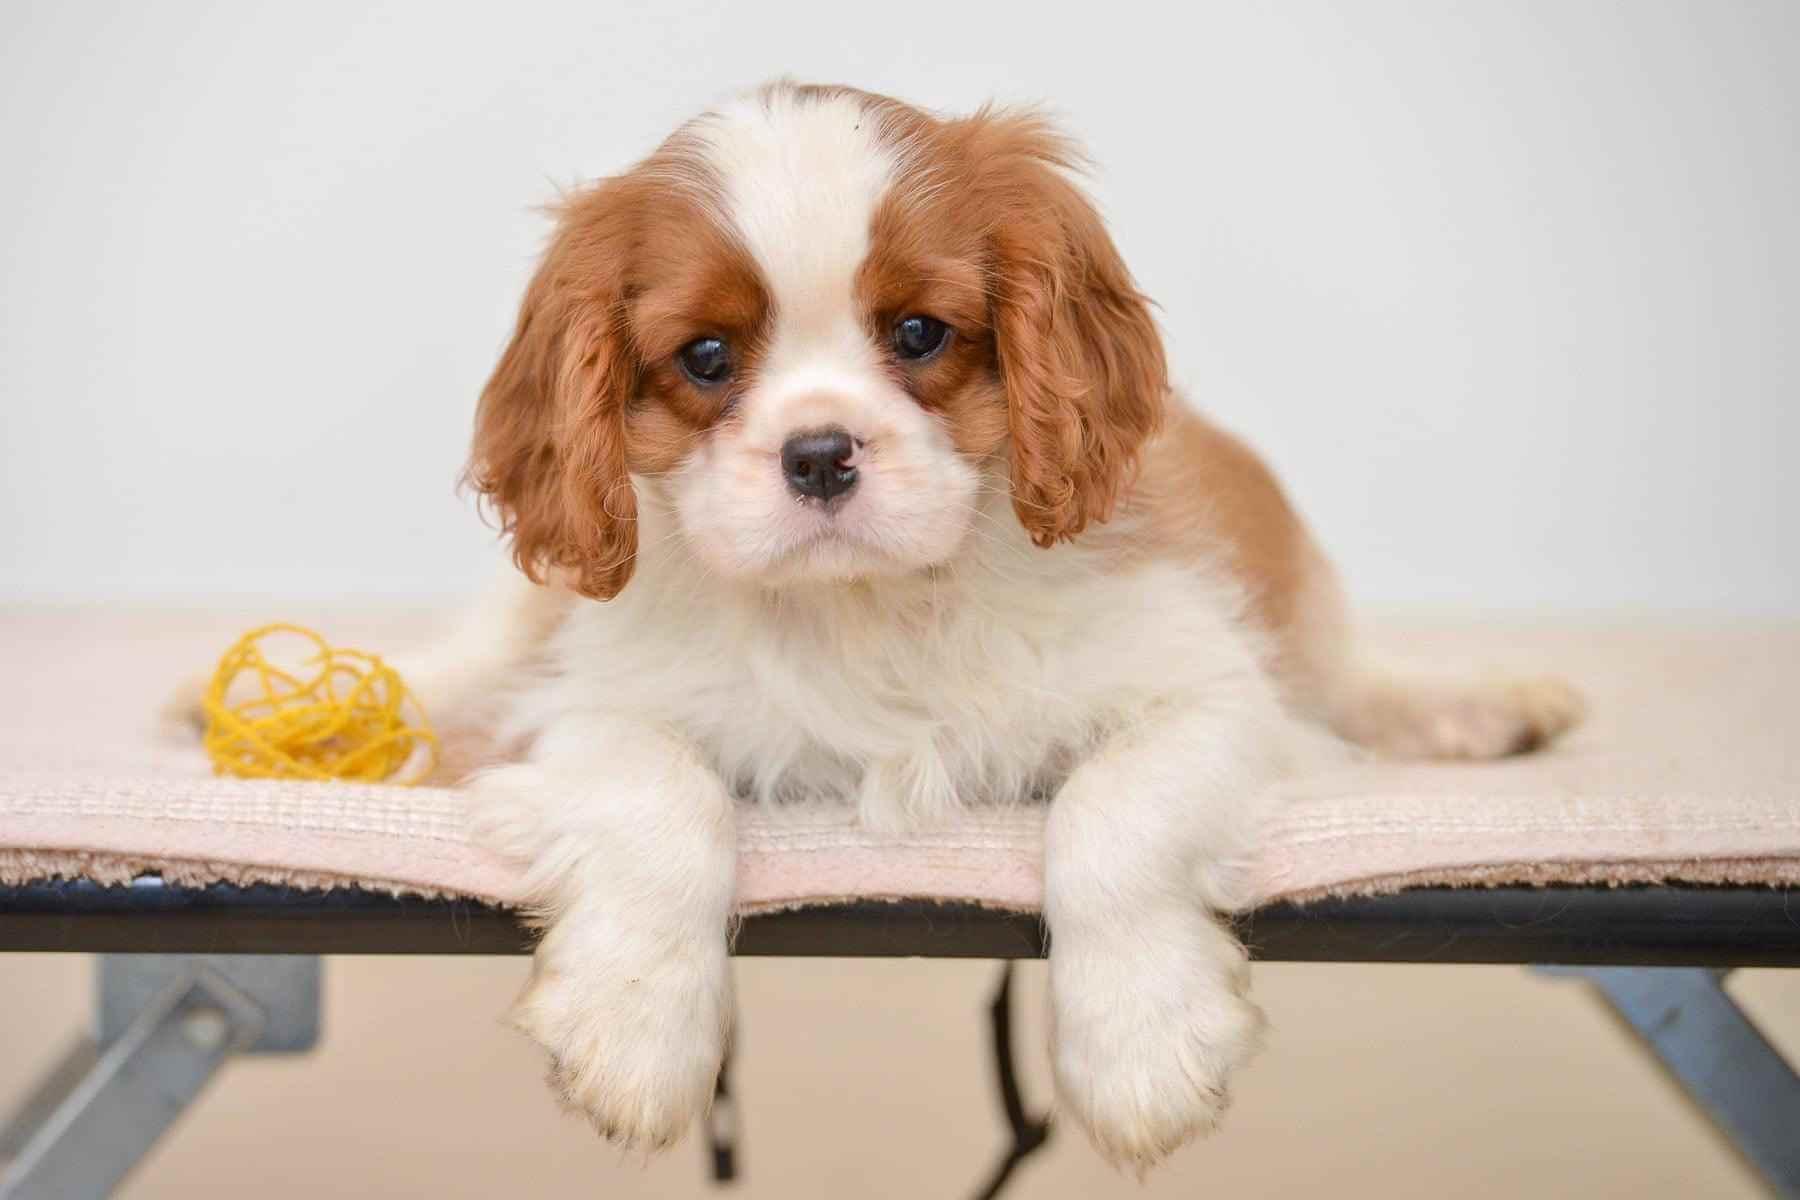 Cavalier King Charles Spaniel Puppy For Sale In Delhi Ncr Dav Pet Lovers